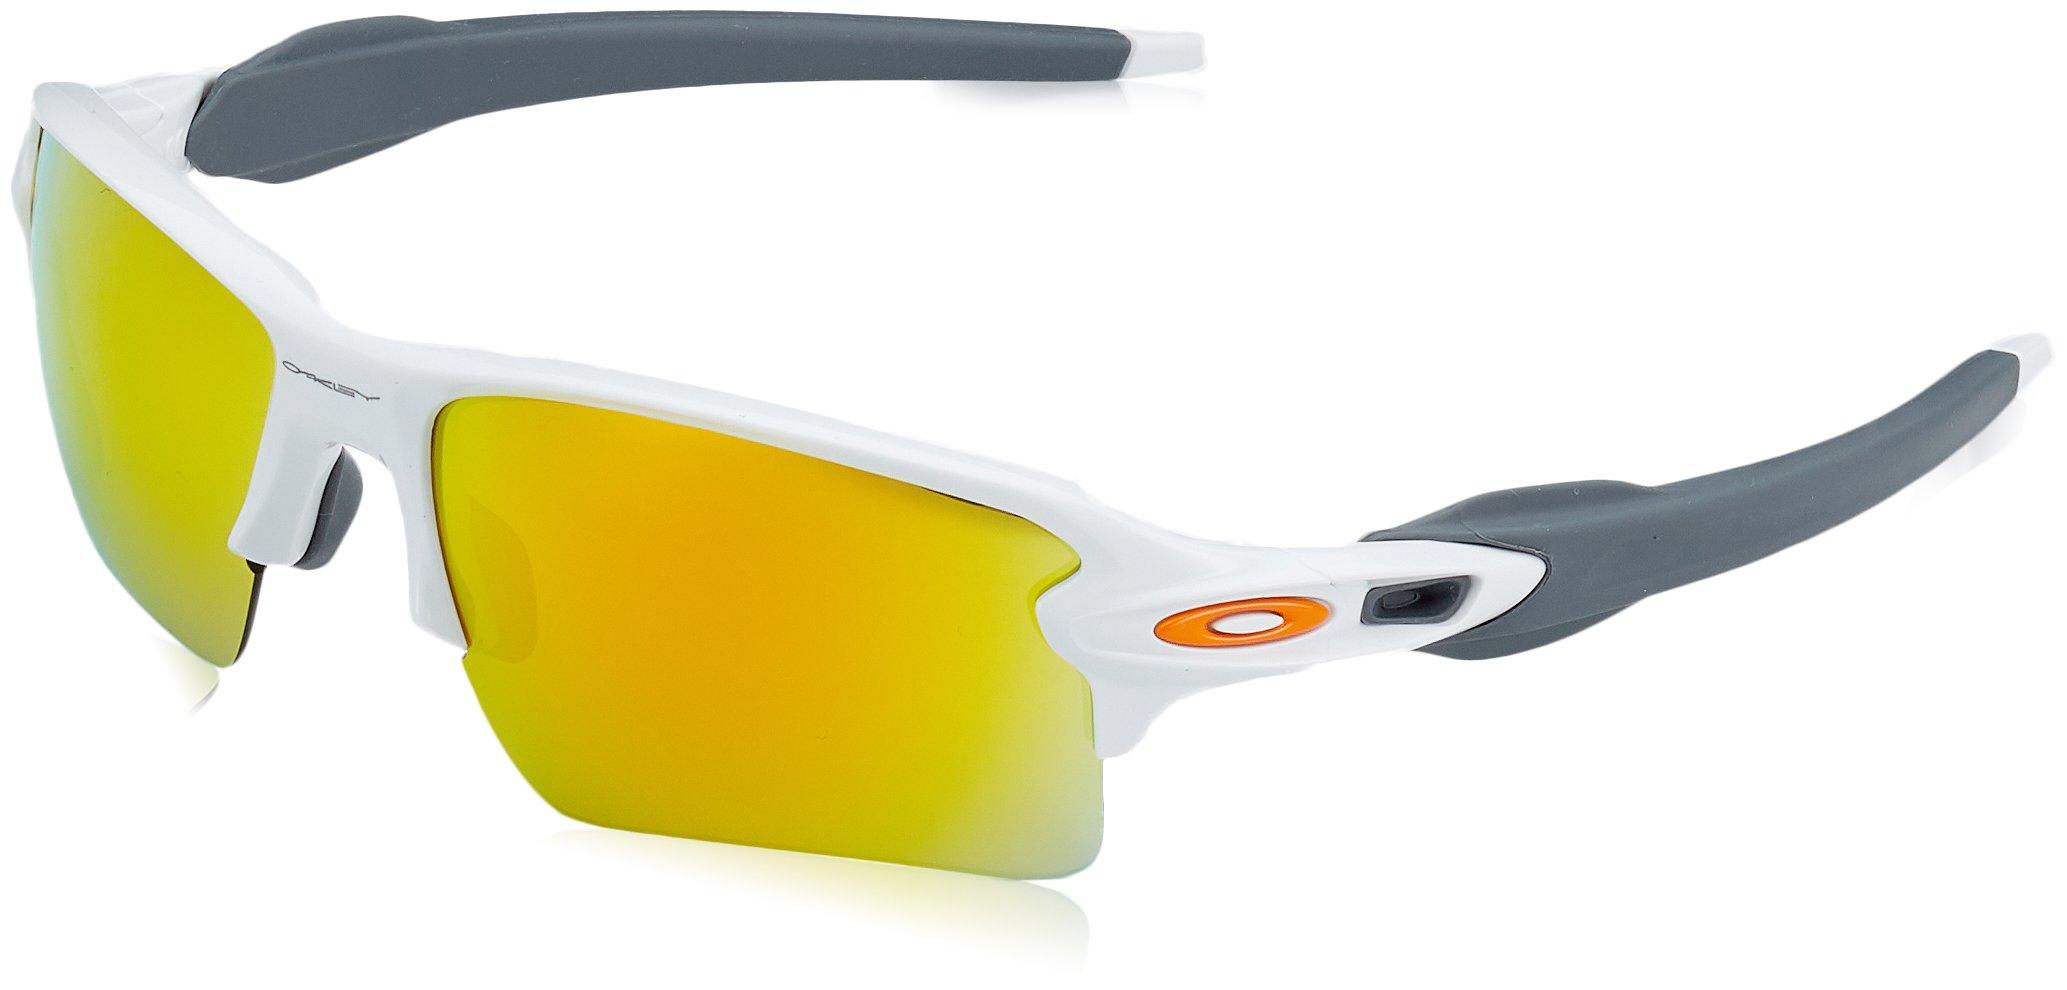 Oakley Men's Flak 2.0 XL OO9188-19 Non-Polarized Iridium Rectangular Sunglasses, Polished White, 59 mm